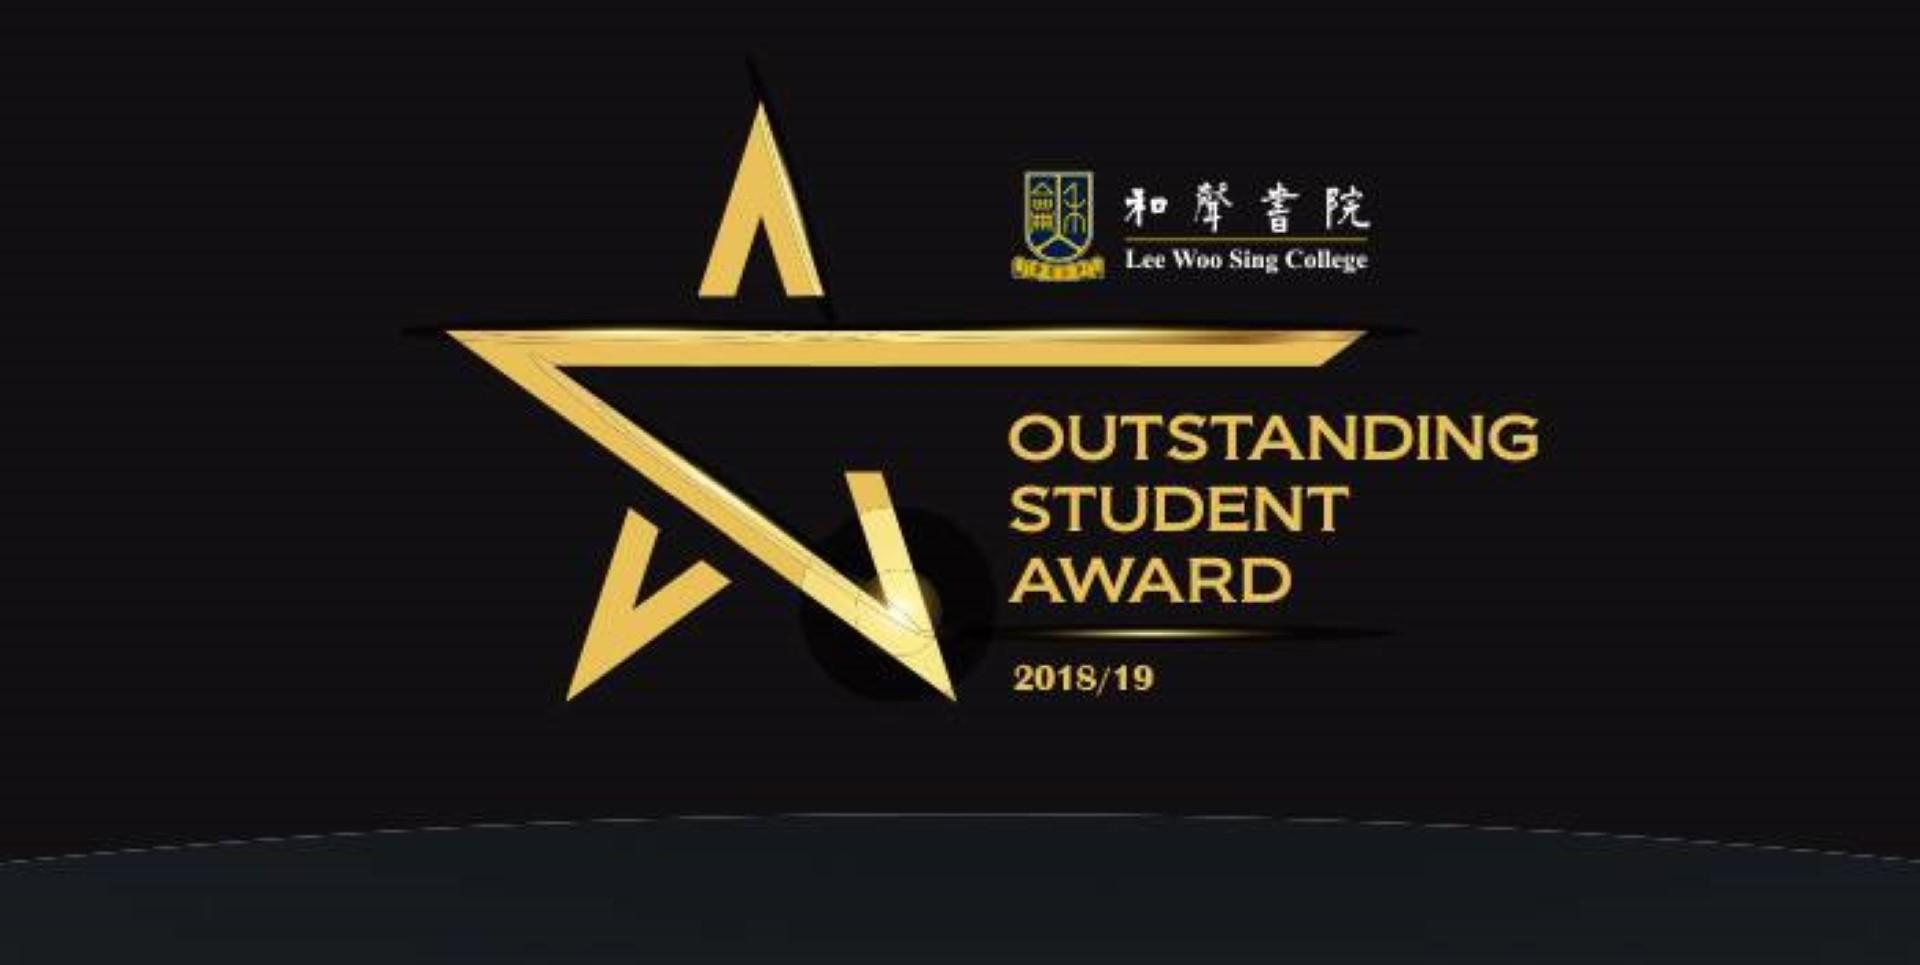 Outstanding Student Award 傑出學生獎